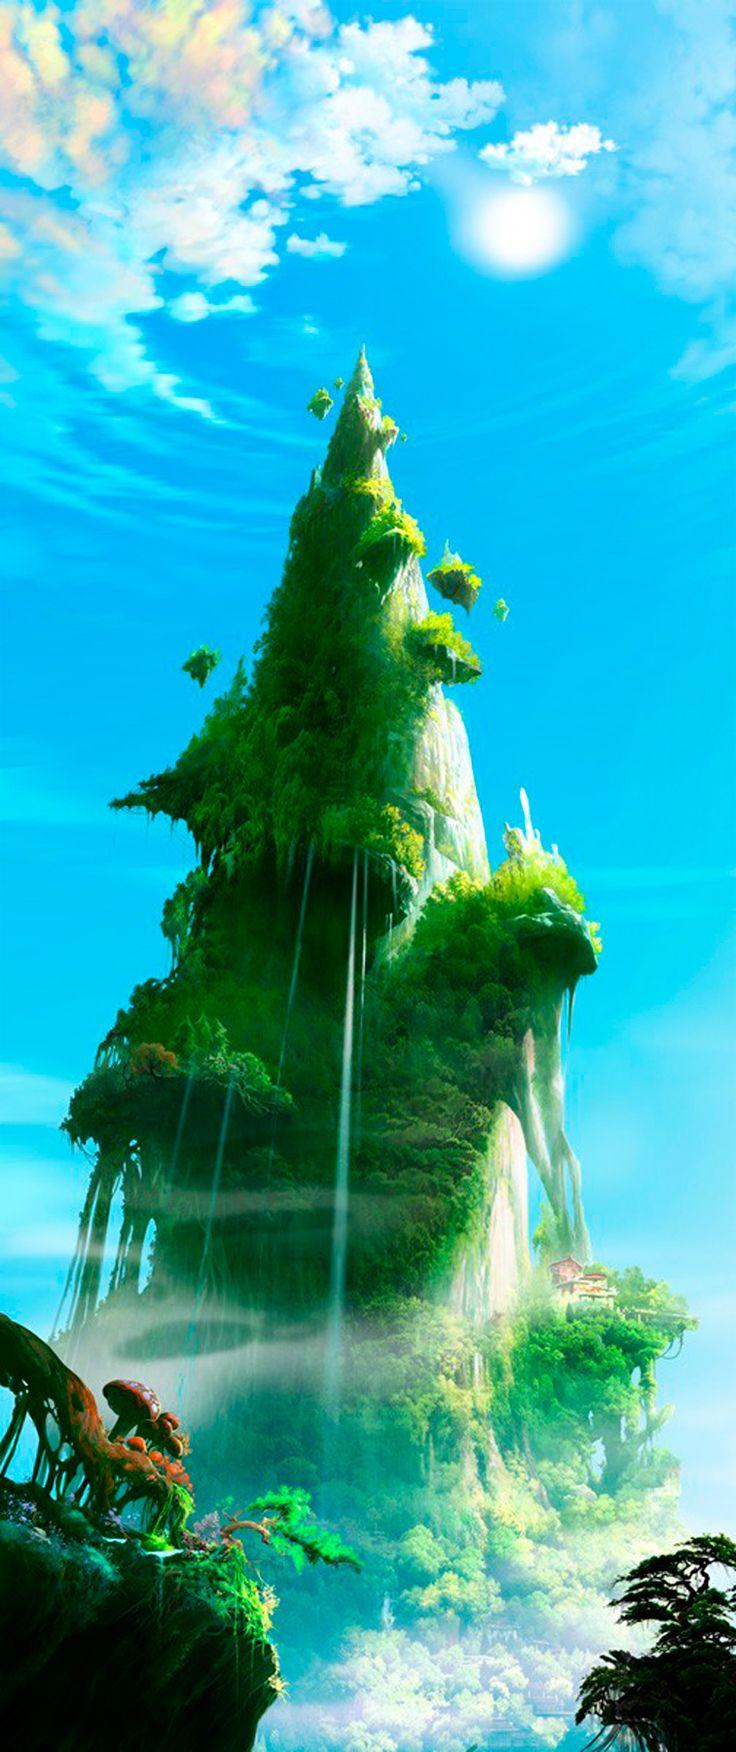 The Art Of Animation, Wolf Smoke Studio